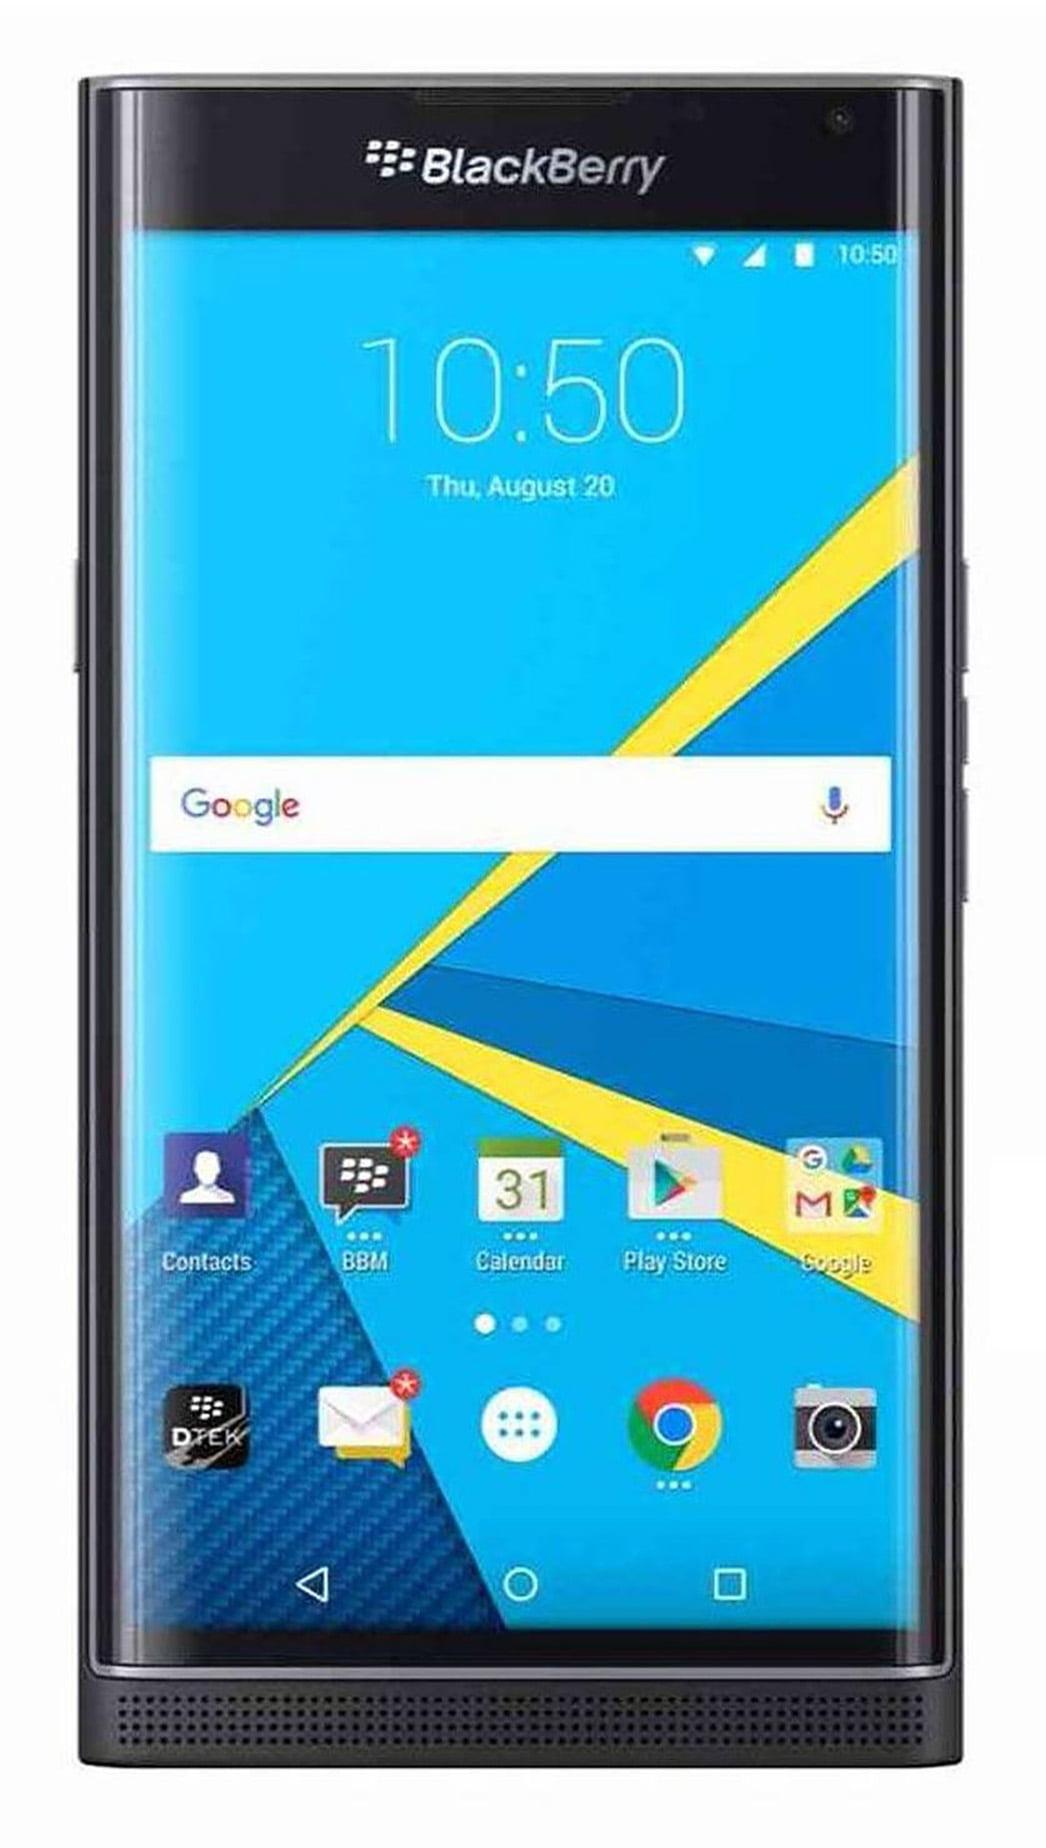 Celular BlackBerry Priv STV100-1 desbloqueado GSM Slider Android teléfono celular - negro (Certified Refurbished) + BlackBerry en VeoyCompro.com.co